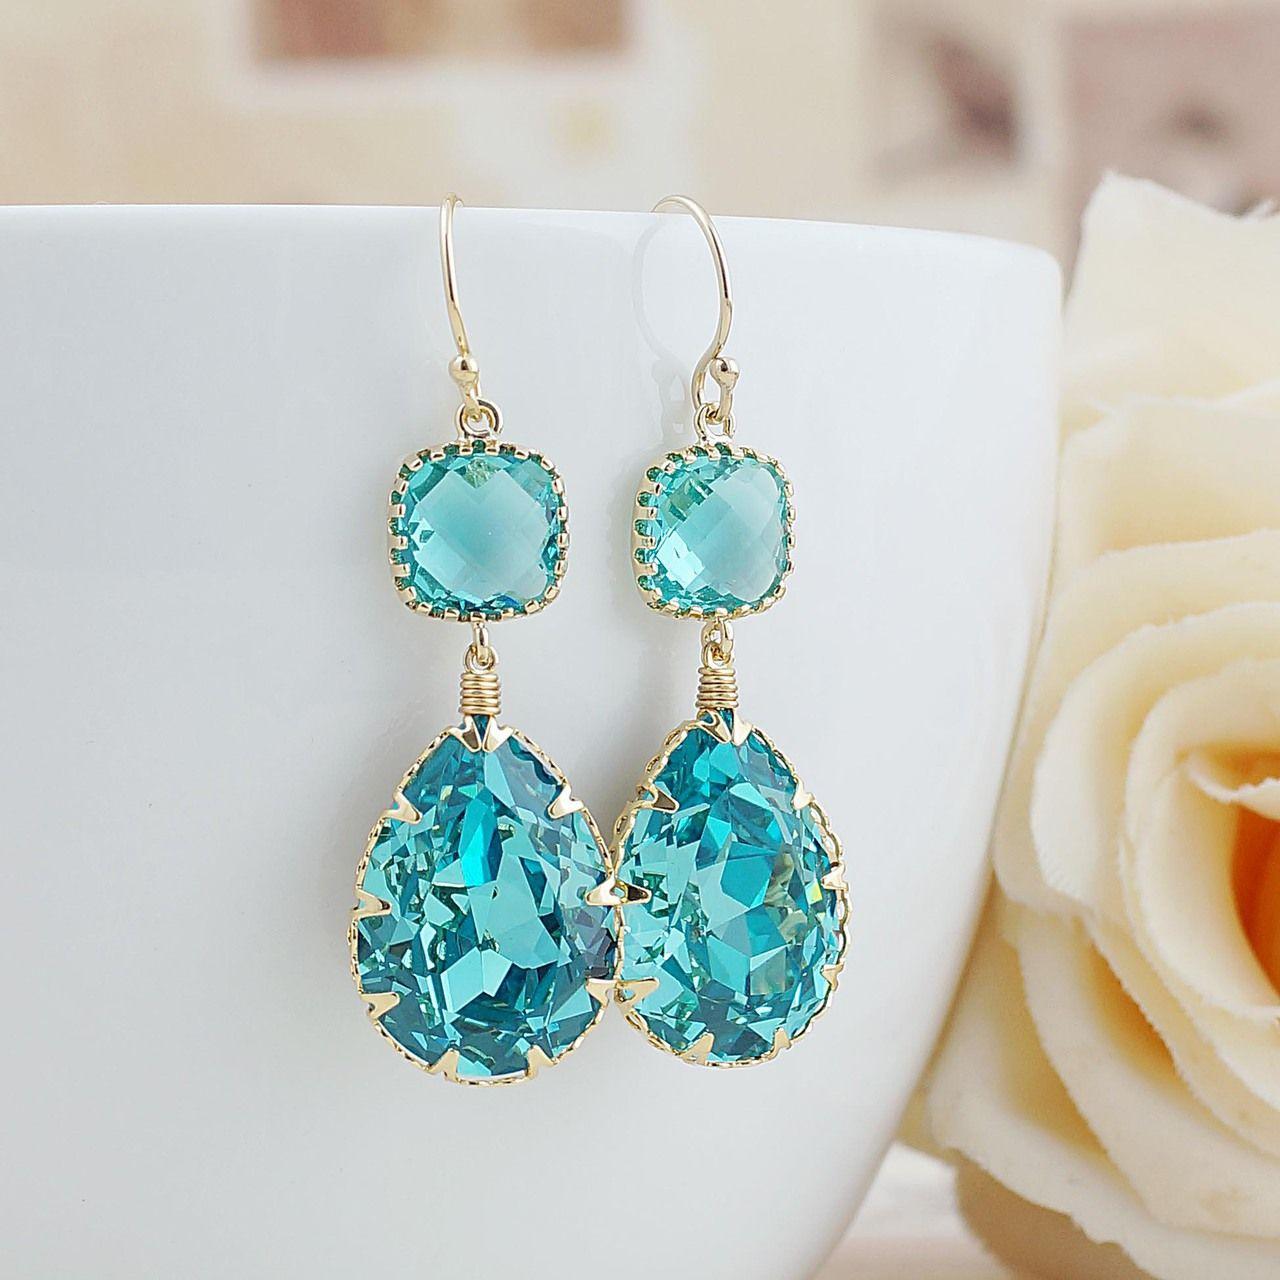 Light turquoise swarovski crystal earrings by